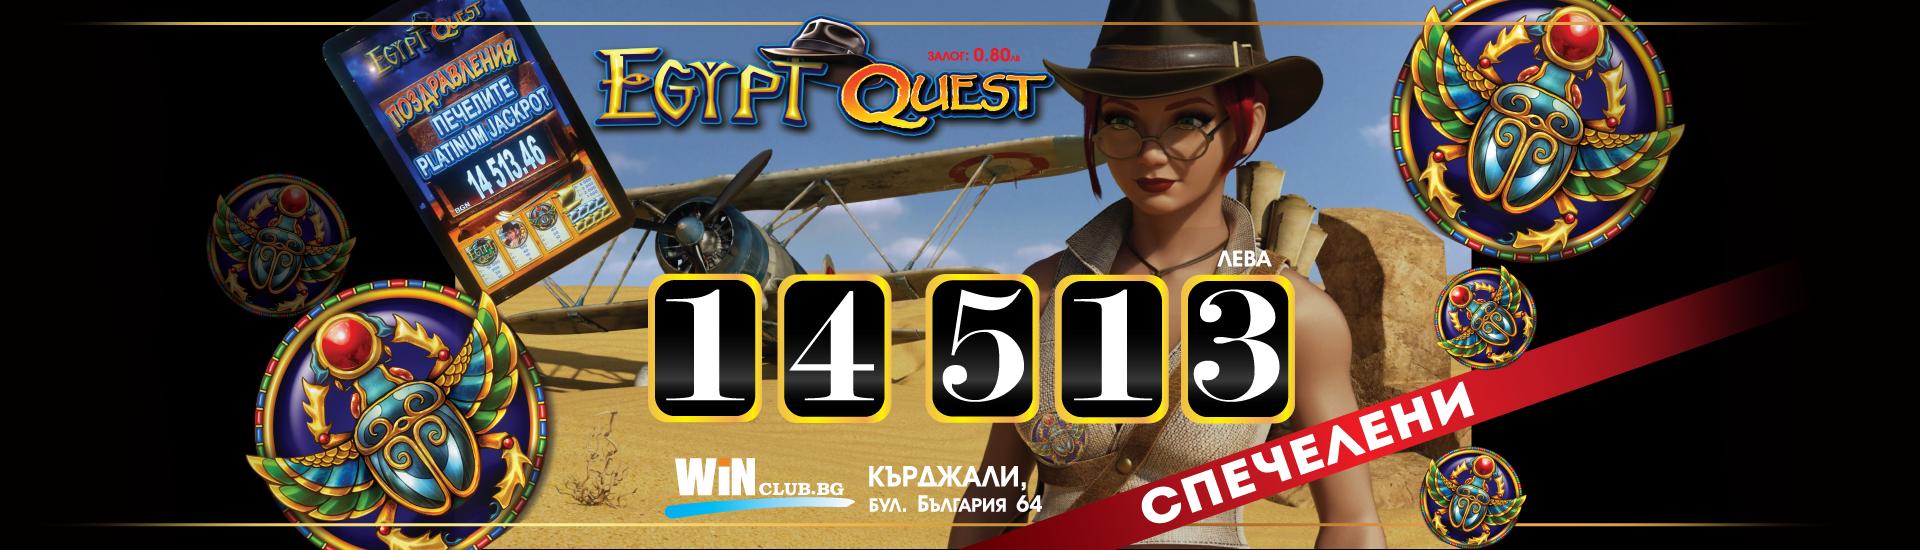 baner-KH-EGYPT-QUEST